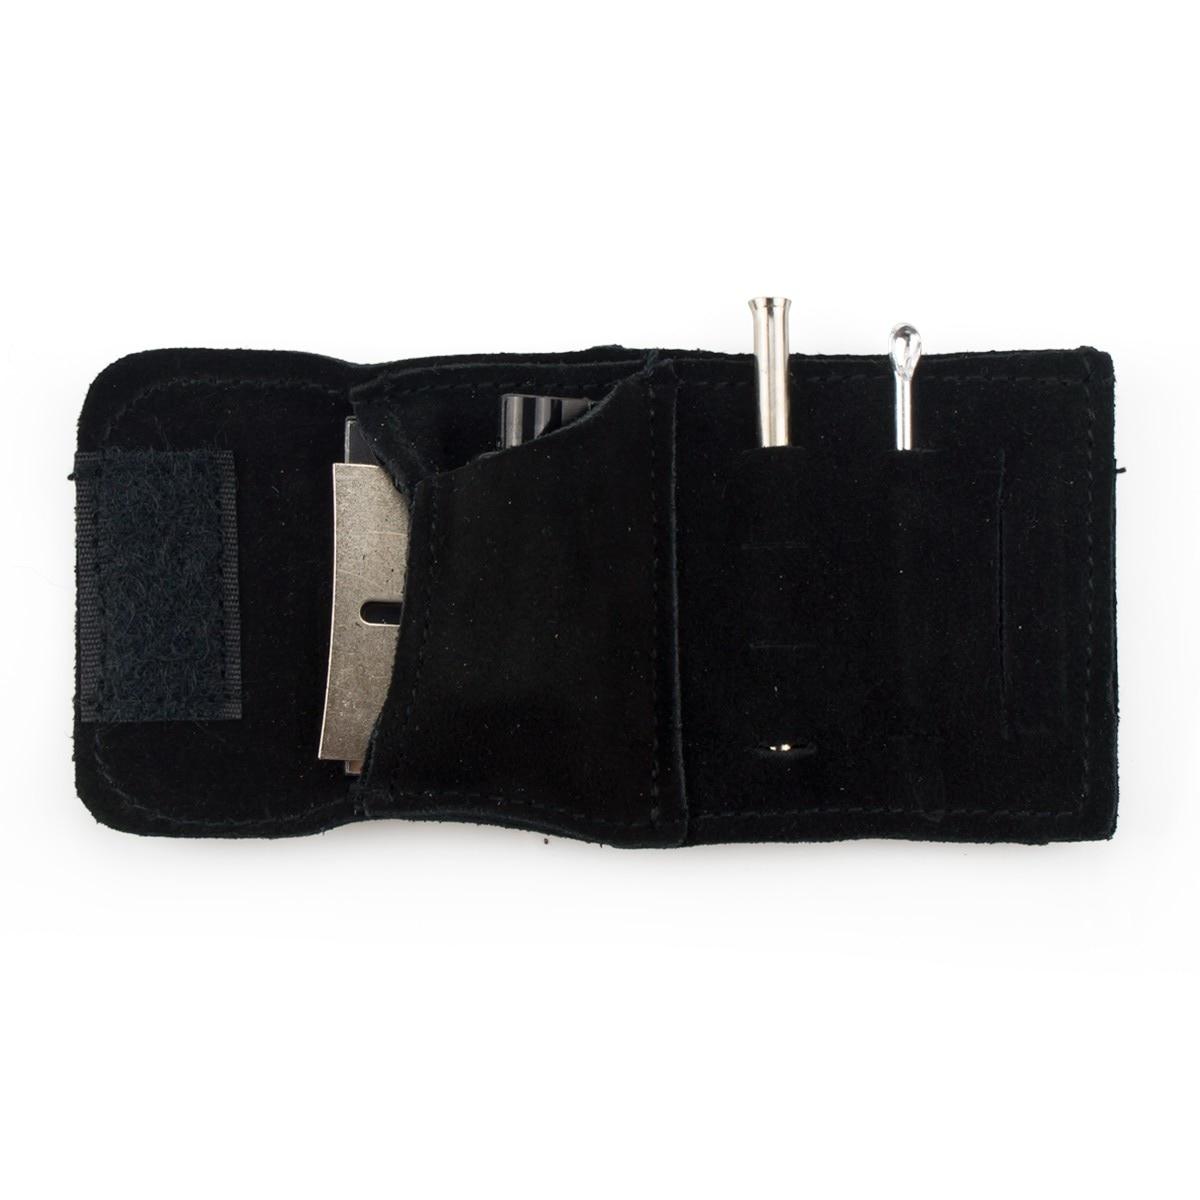 Formax420 13,5mm X 6,5mm tamaño pequeño de Kit de tabaco de Sniffer Snorter tubo dispensador de polvo